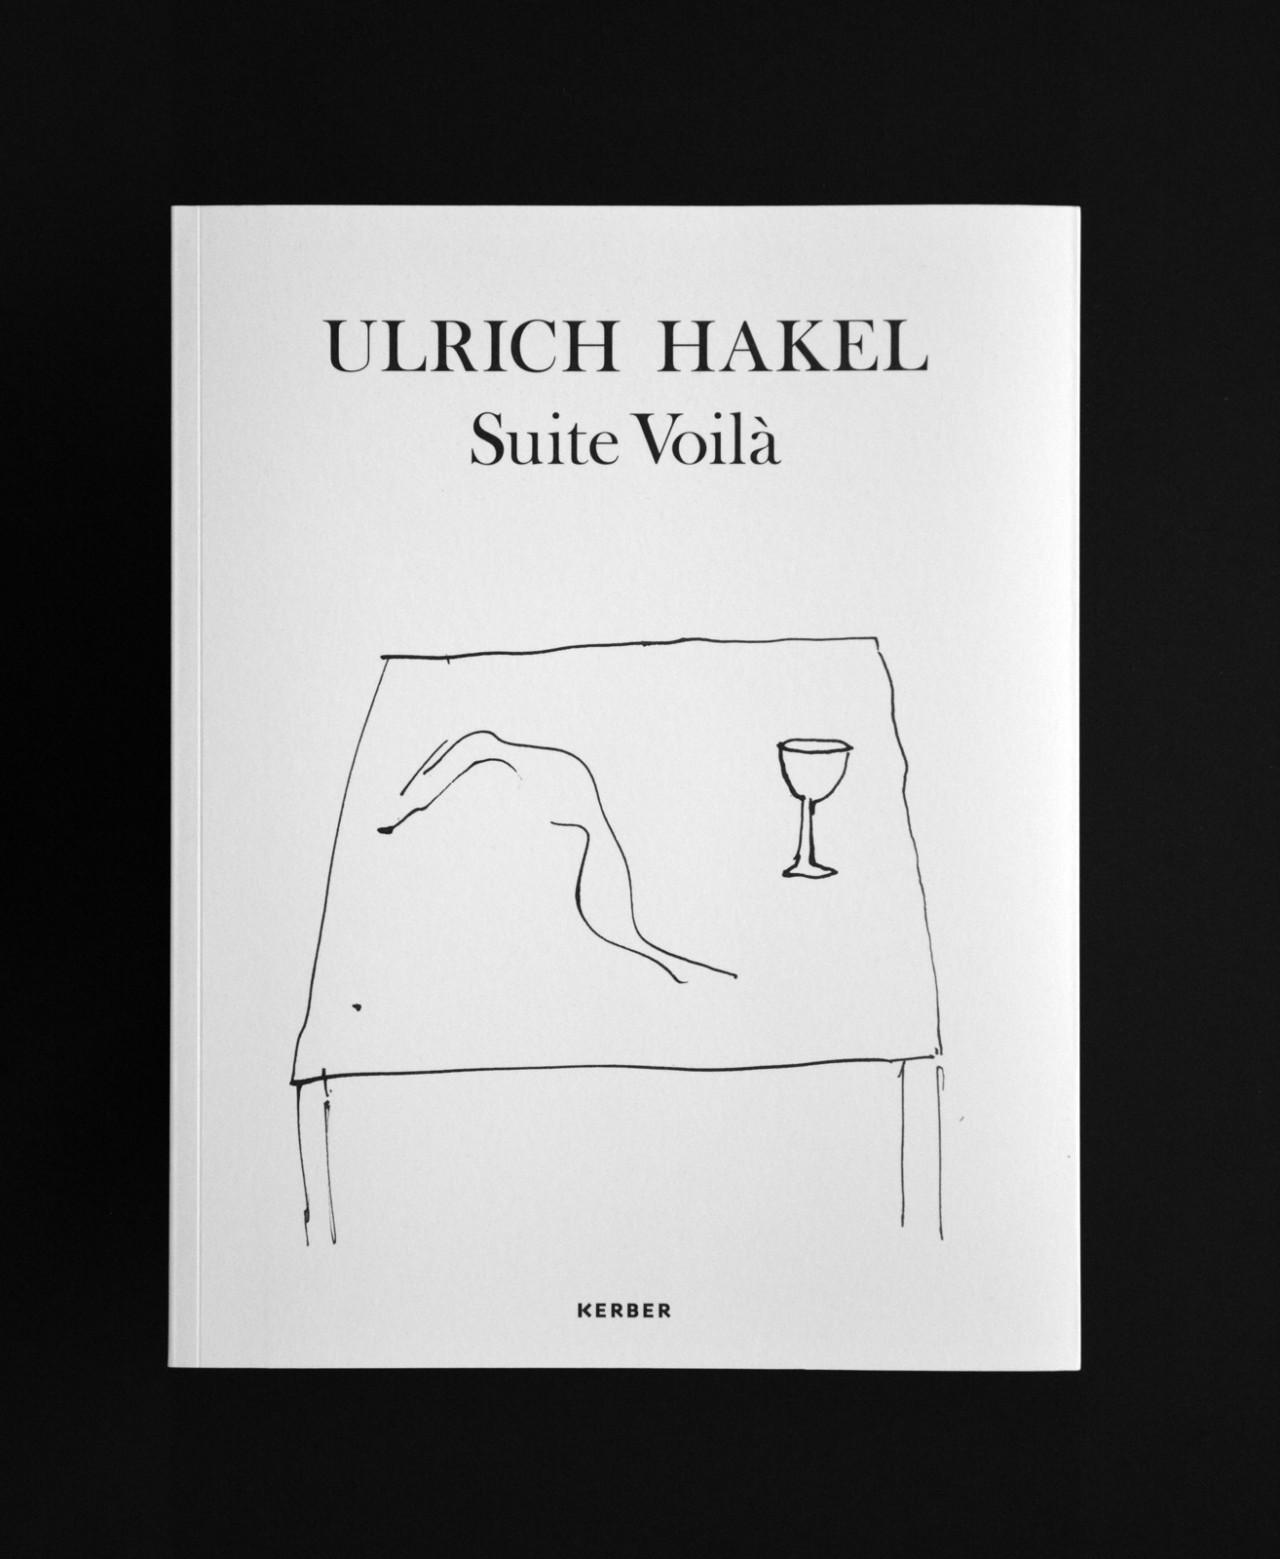 Ulrich Hakel Suite Voilà